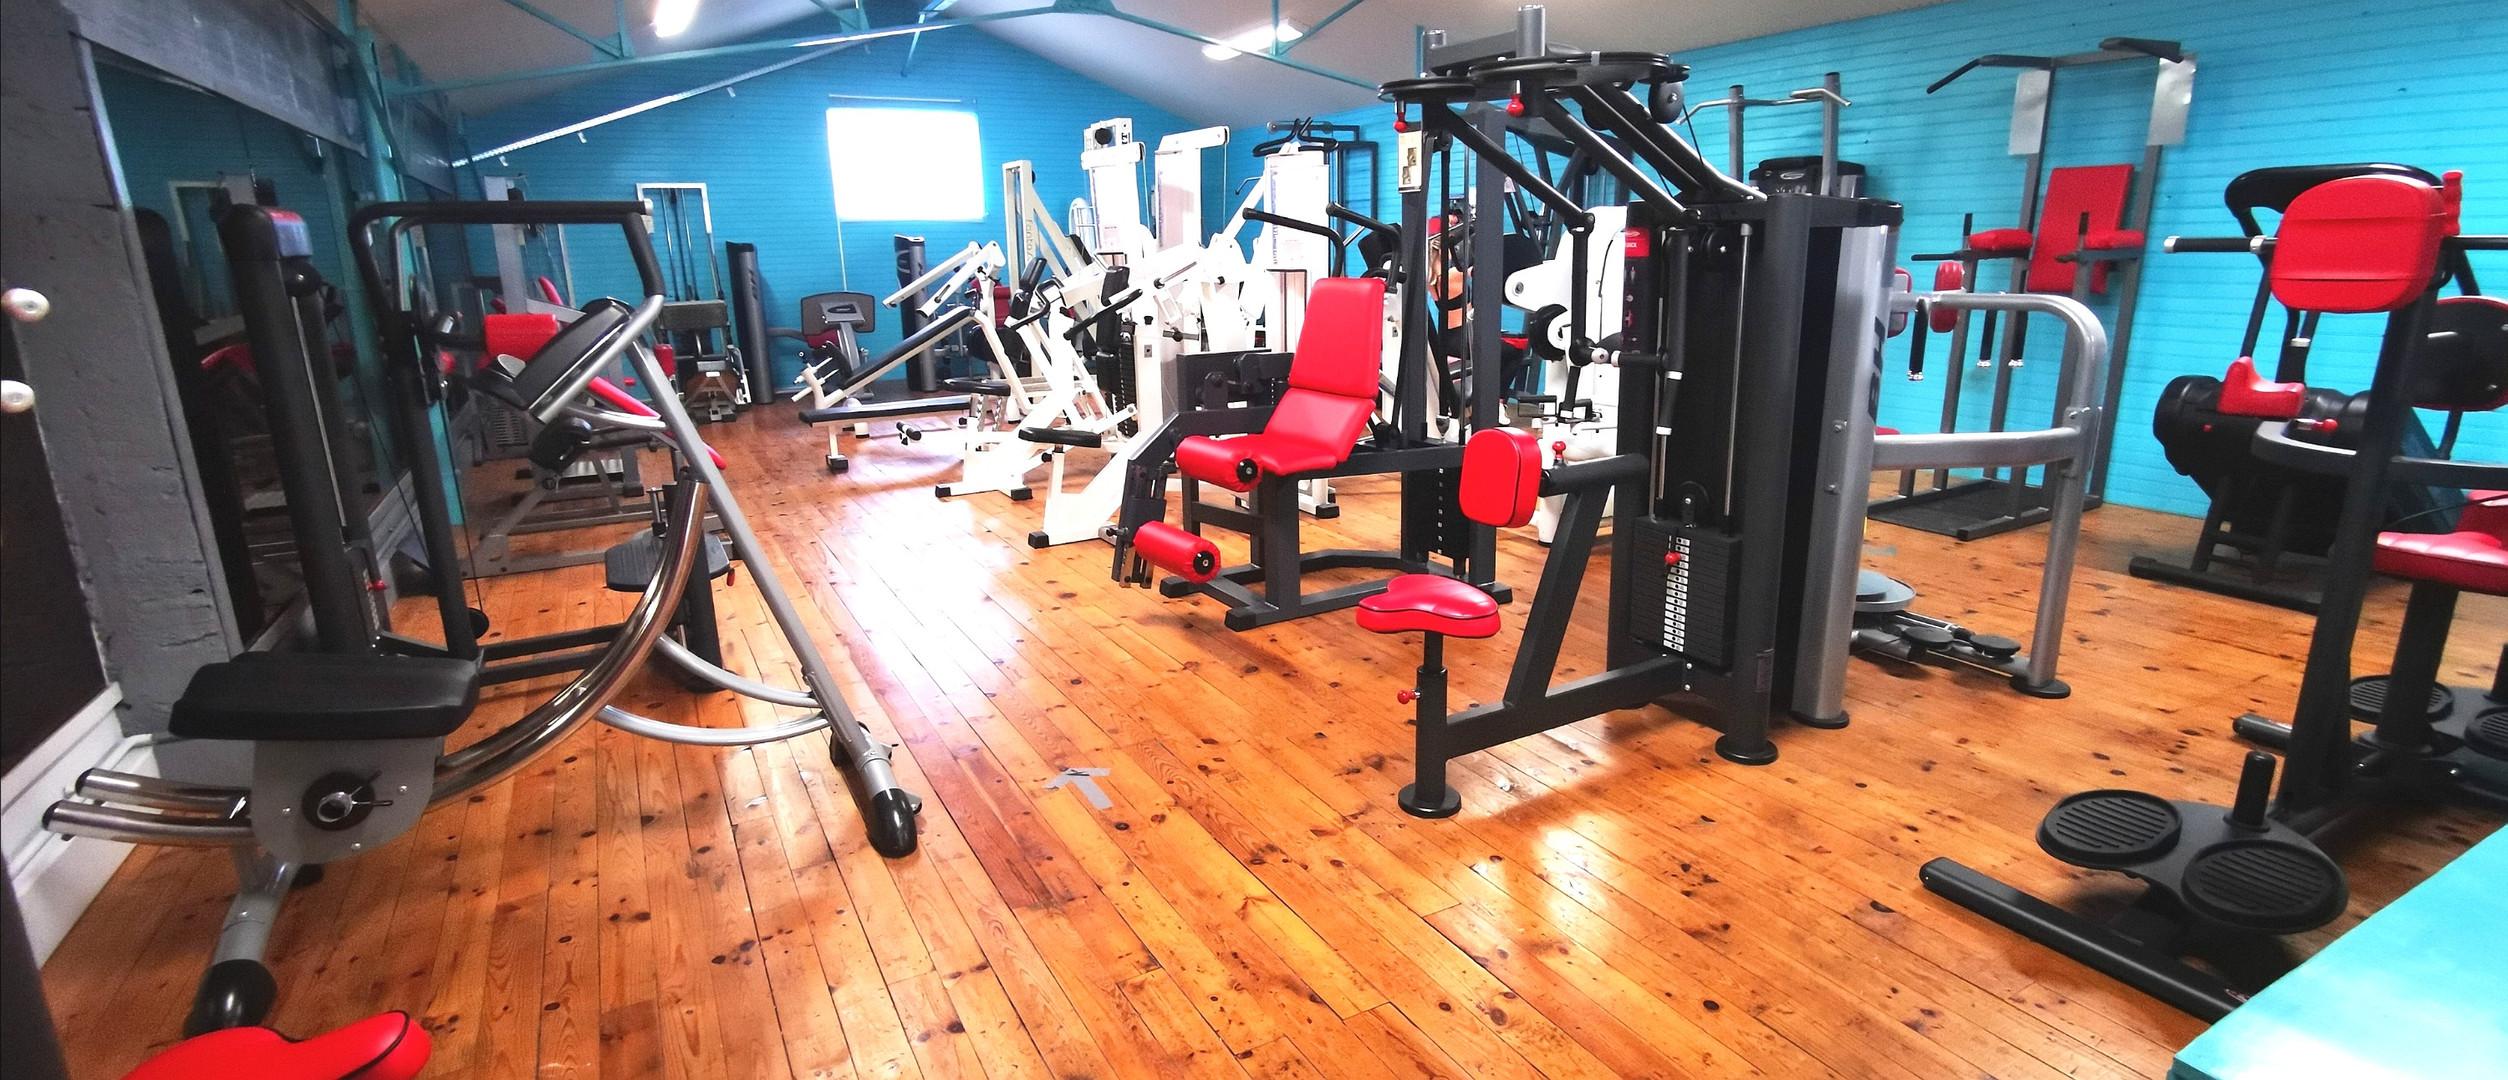 Salle de Musculation côté machines